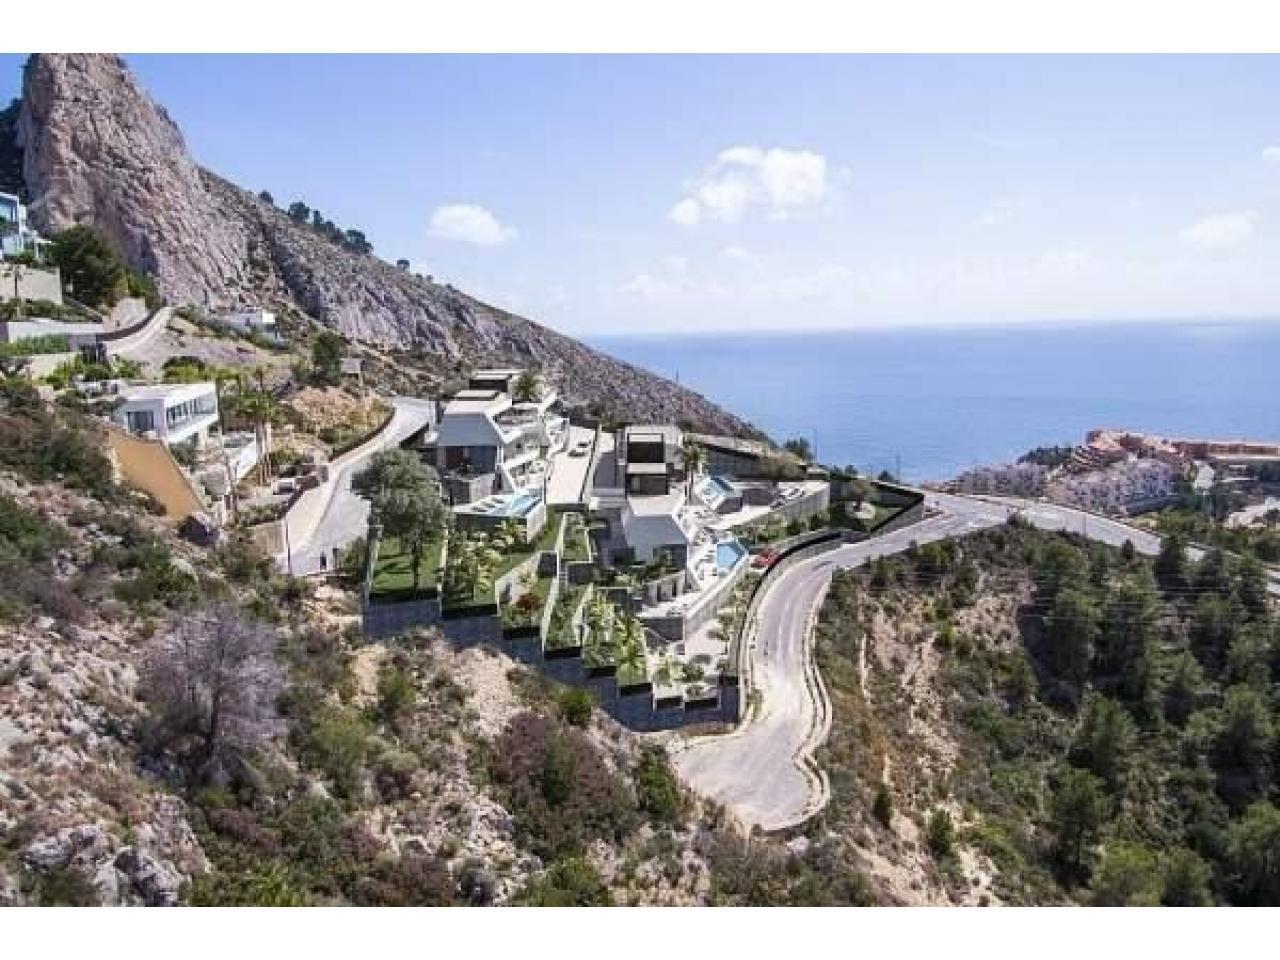 Недвижимость в Испании, Новая вилла с видами на море от застройщика в Альтеа,Коста Бланка,Испания - 2